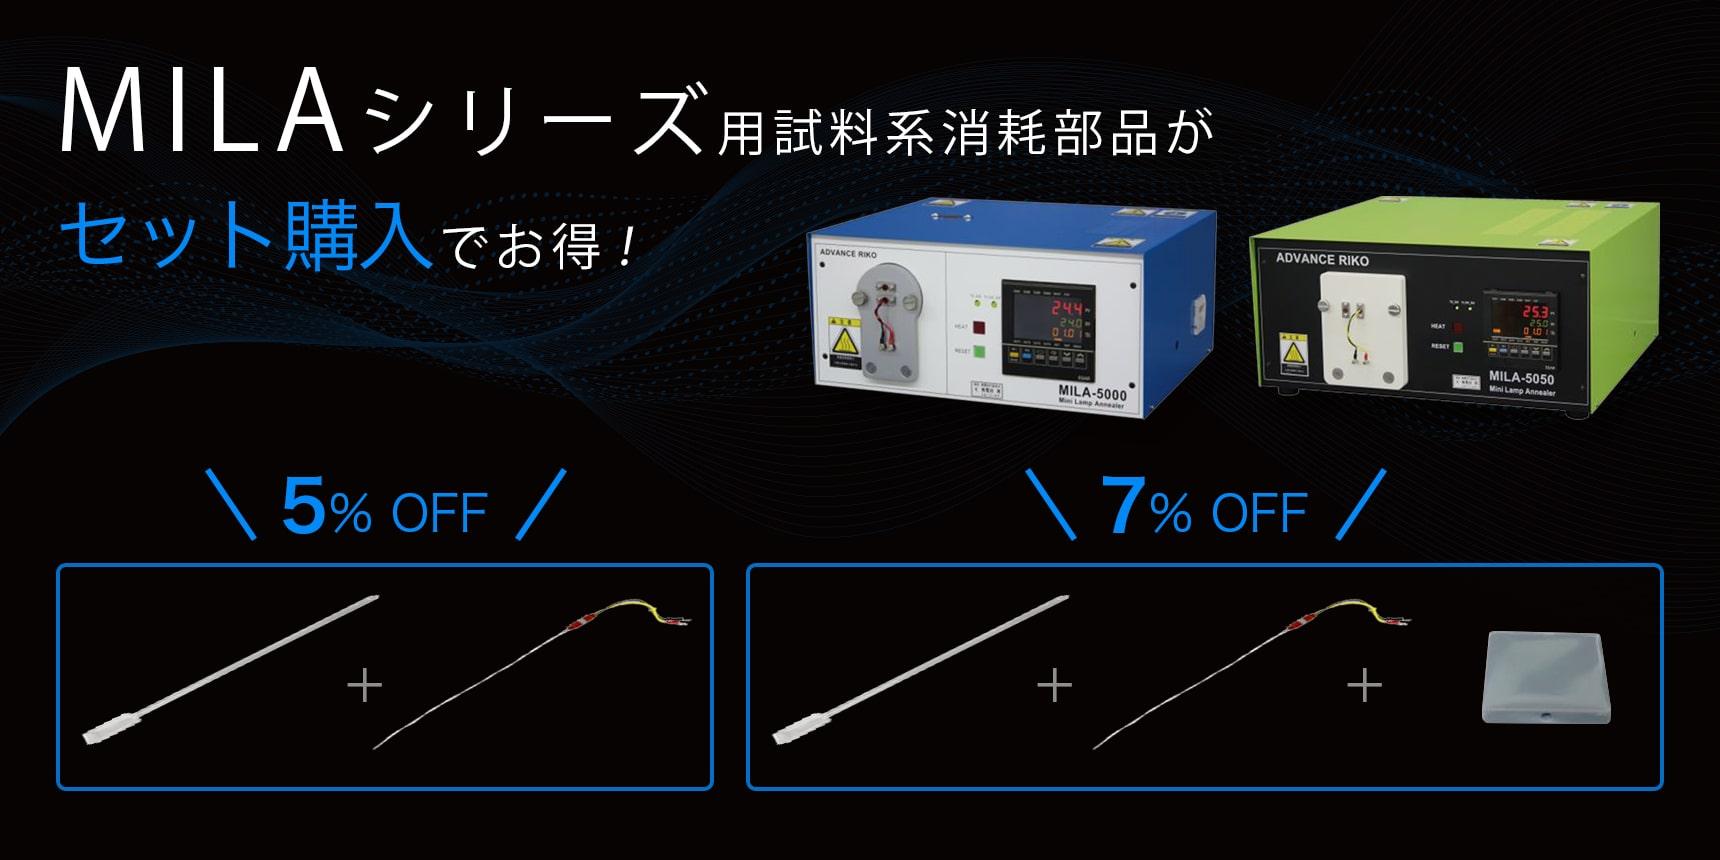 MILAシリーズ用試料系消耗部品が セット購入でお得!